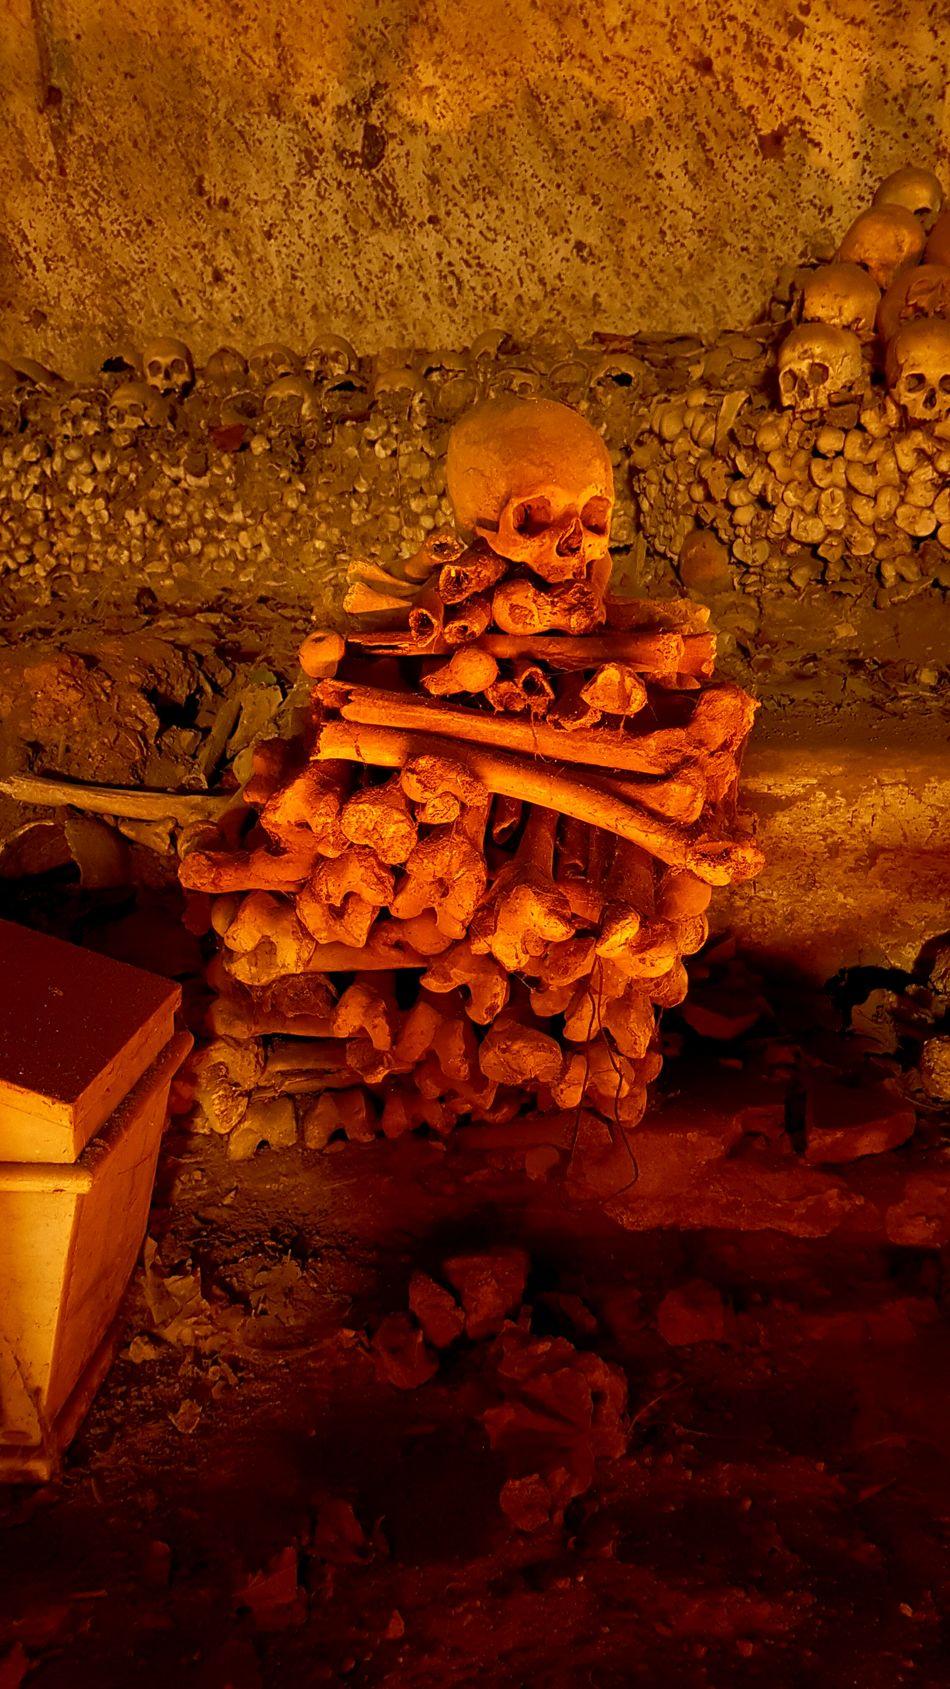 Skull Bones Cimitero Delle Fontanelle Naples Italy Halloween